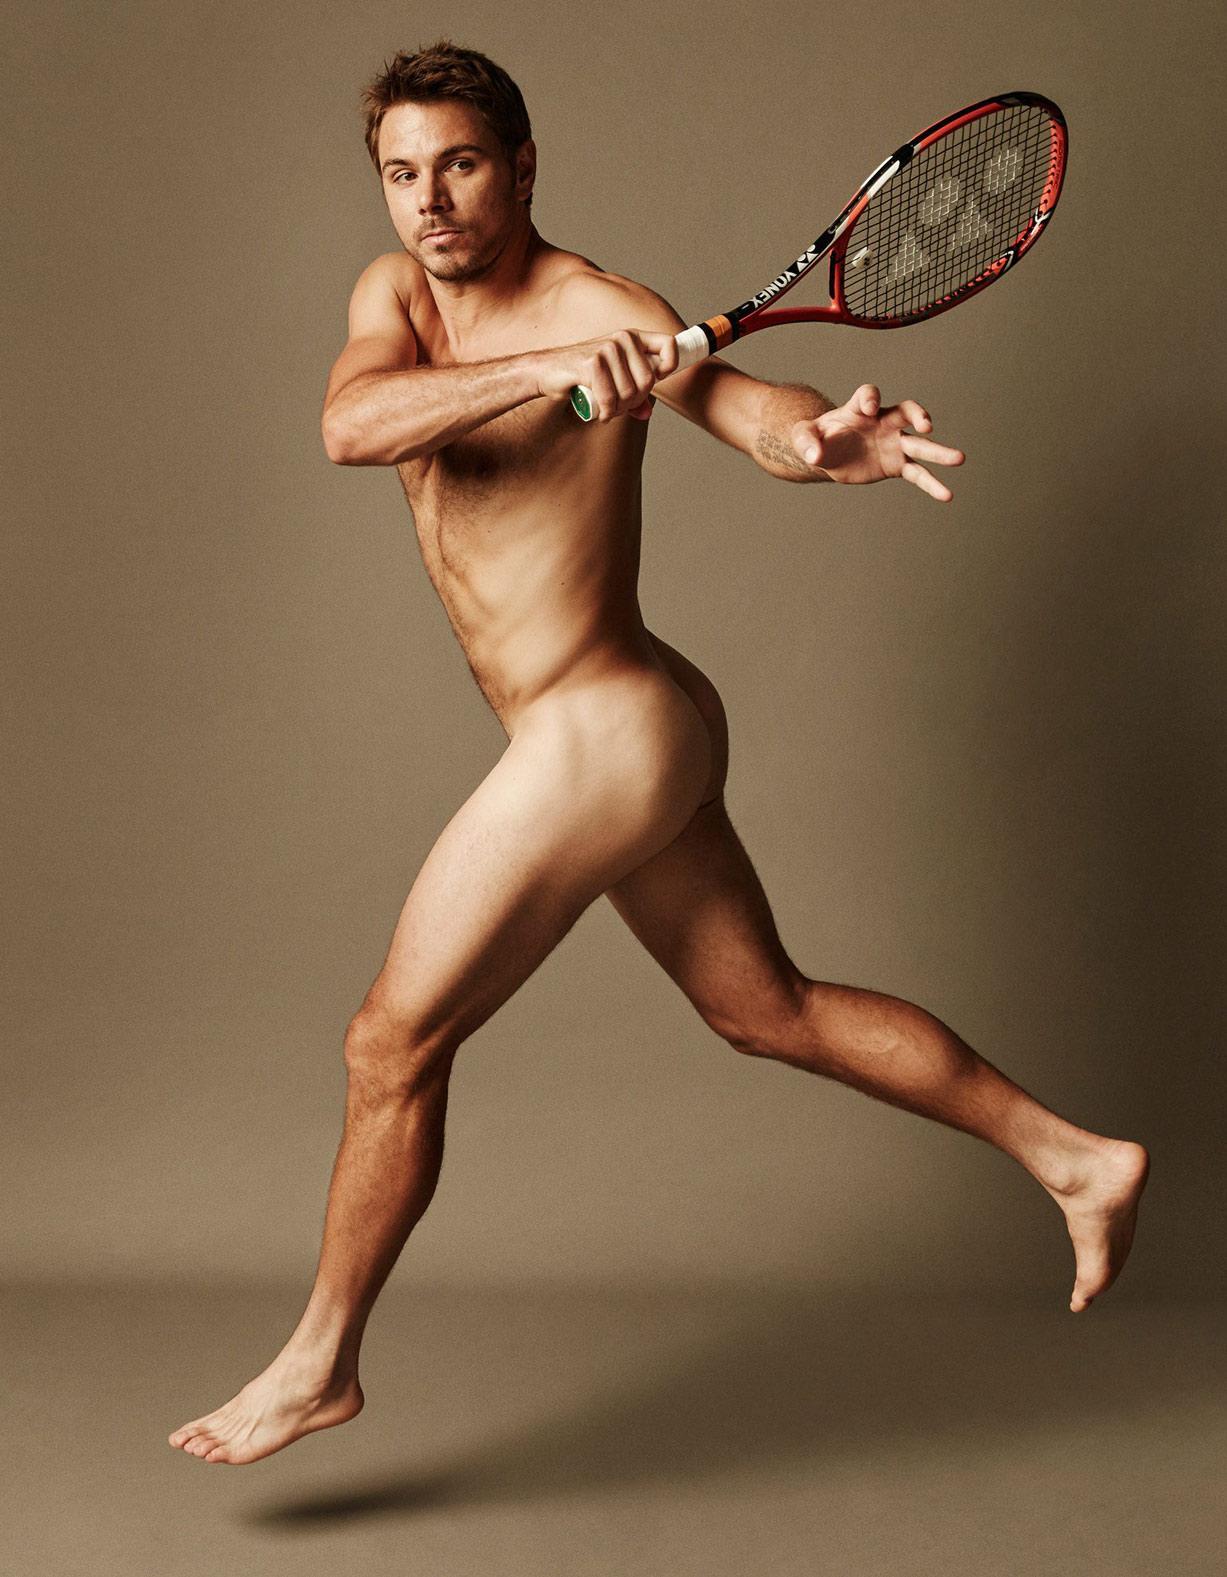 ESPN Magazine The Body Issue 2015 - Stan Wawrinka / Стэн - Культ тела журнала ESPN